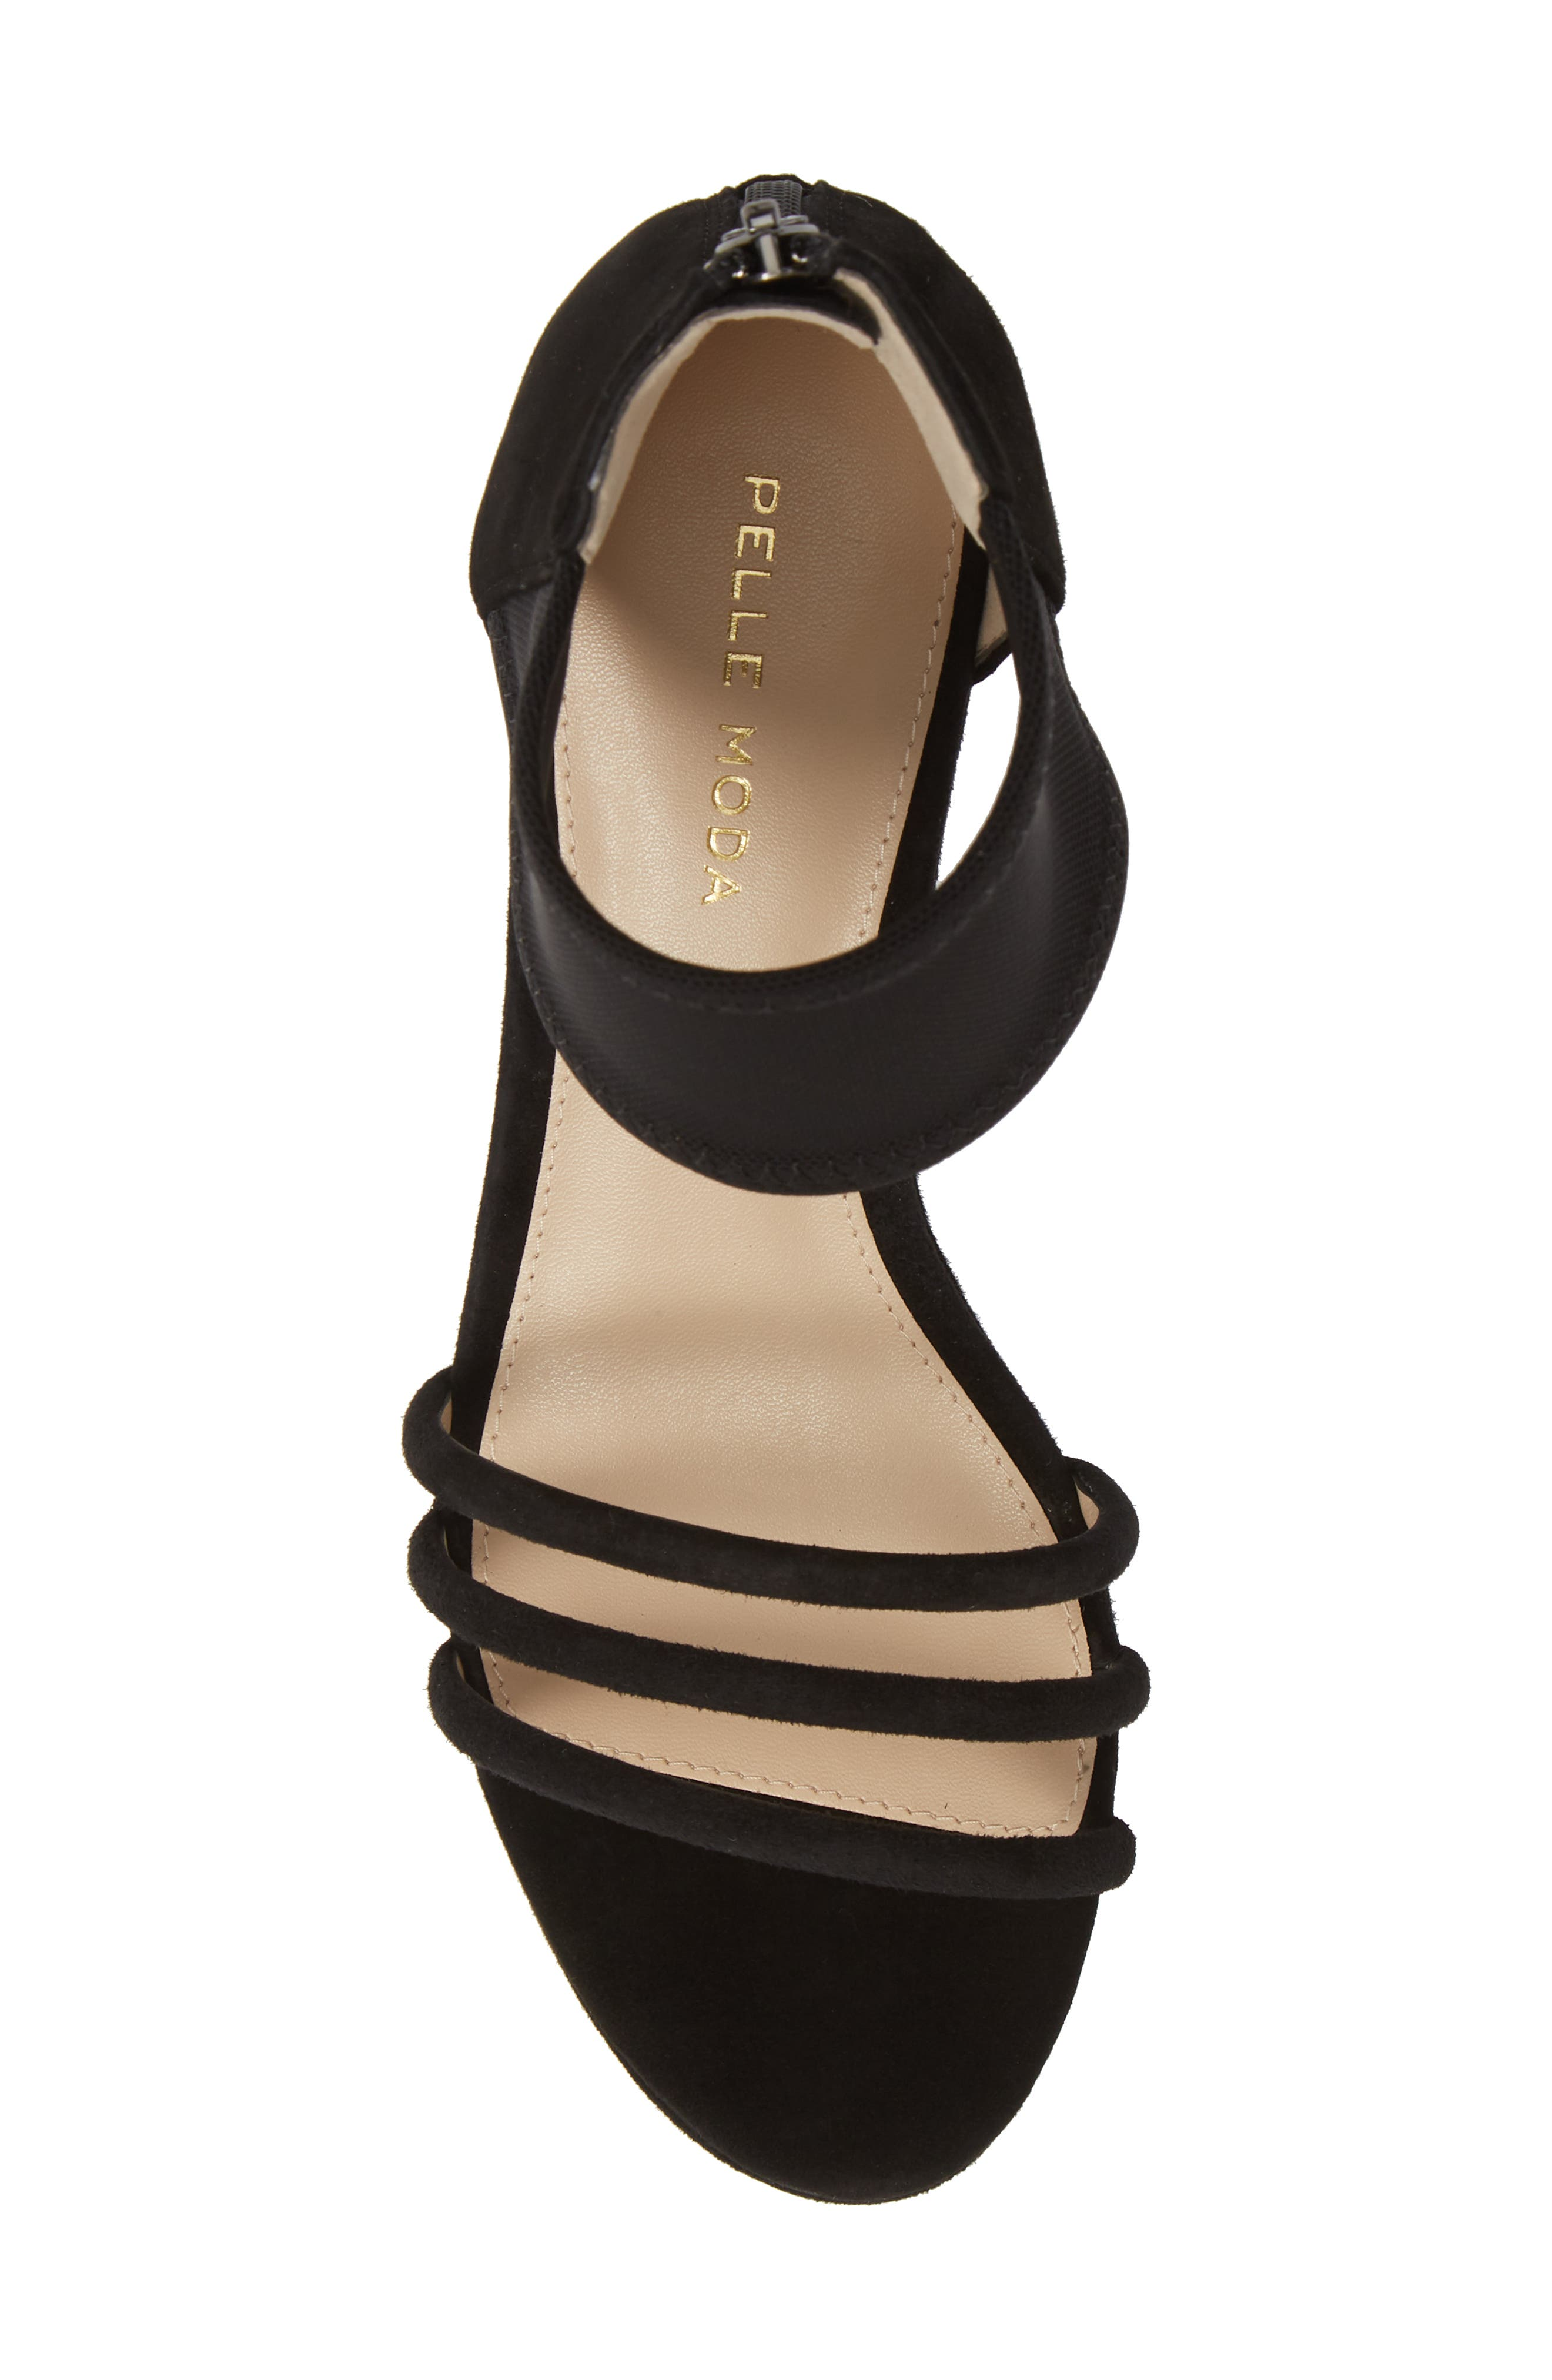 PELLE MODA, Katrice Platform Wedge Sandal, Alternate thumbnail 5, color, BLACK SUEDE